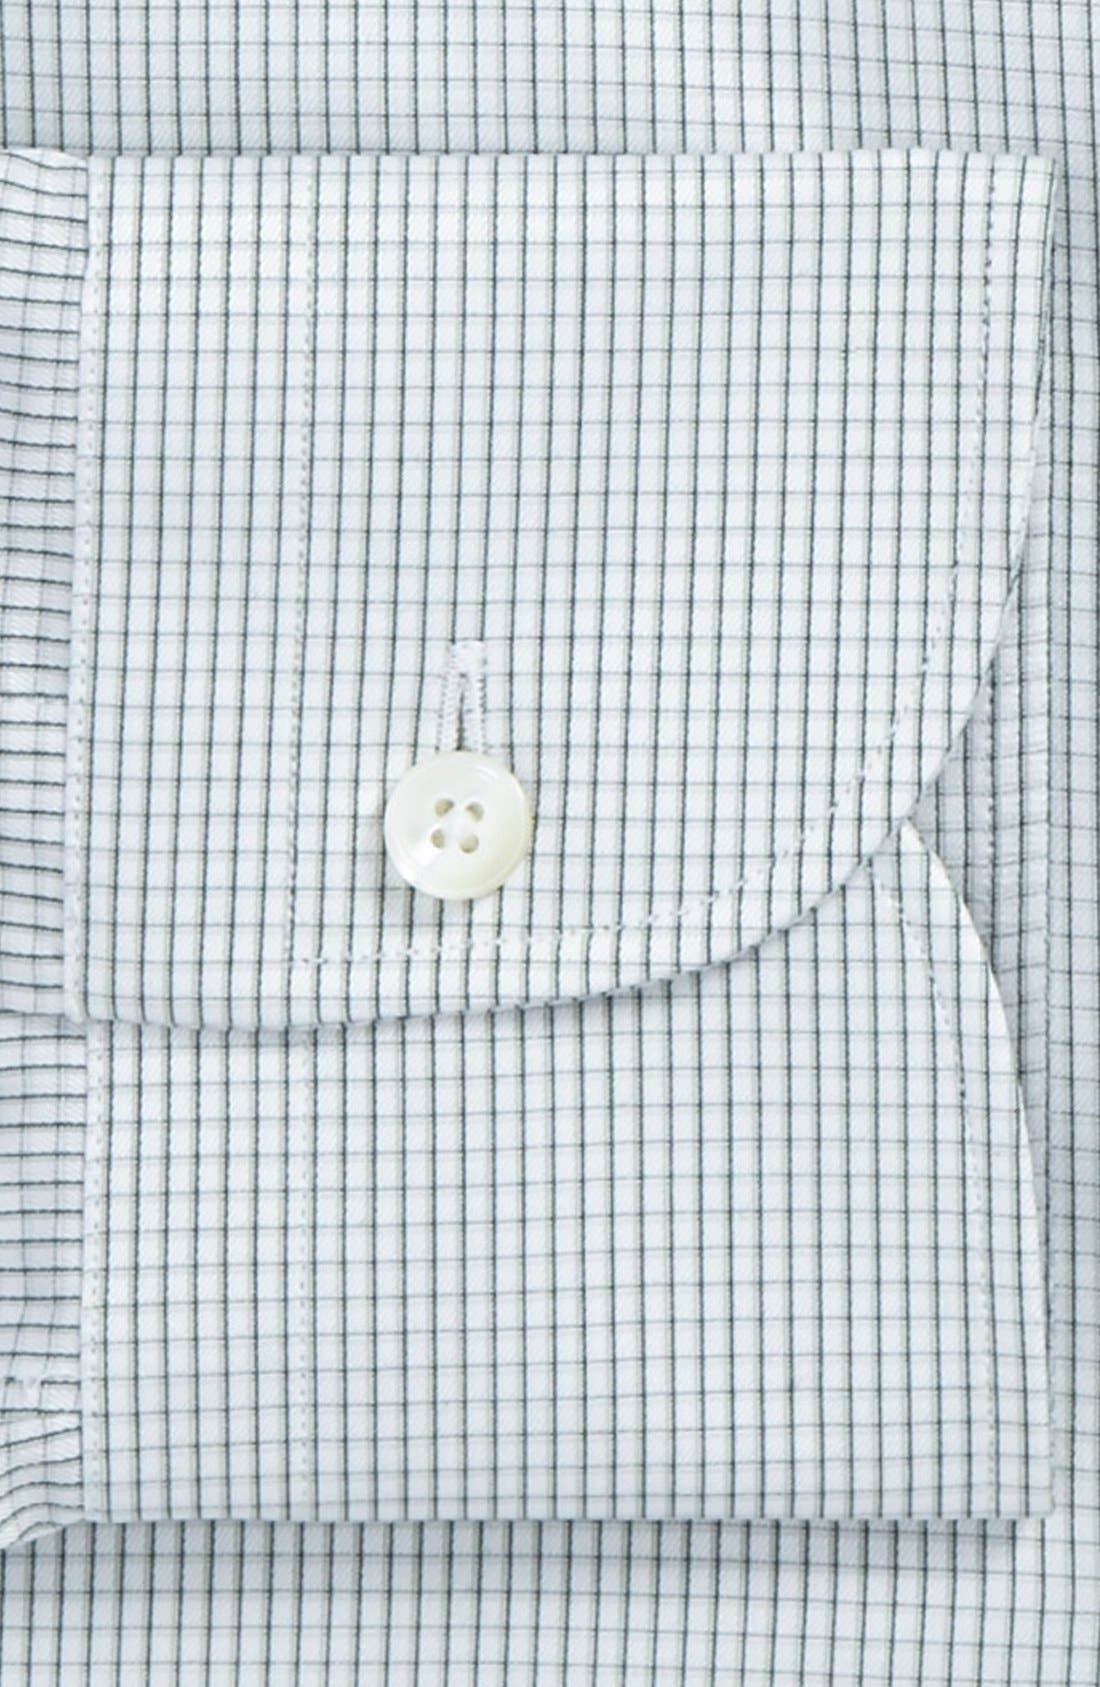 Regular Fit Dress Shirt,                             Alternate thumbnail 2, color,                             306